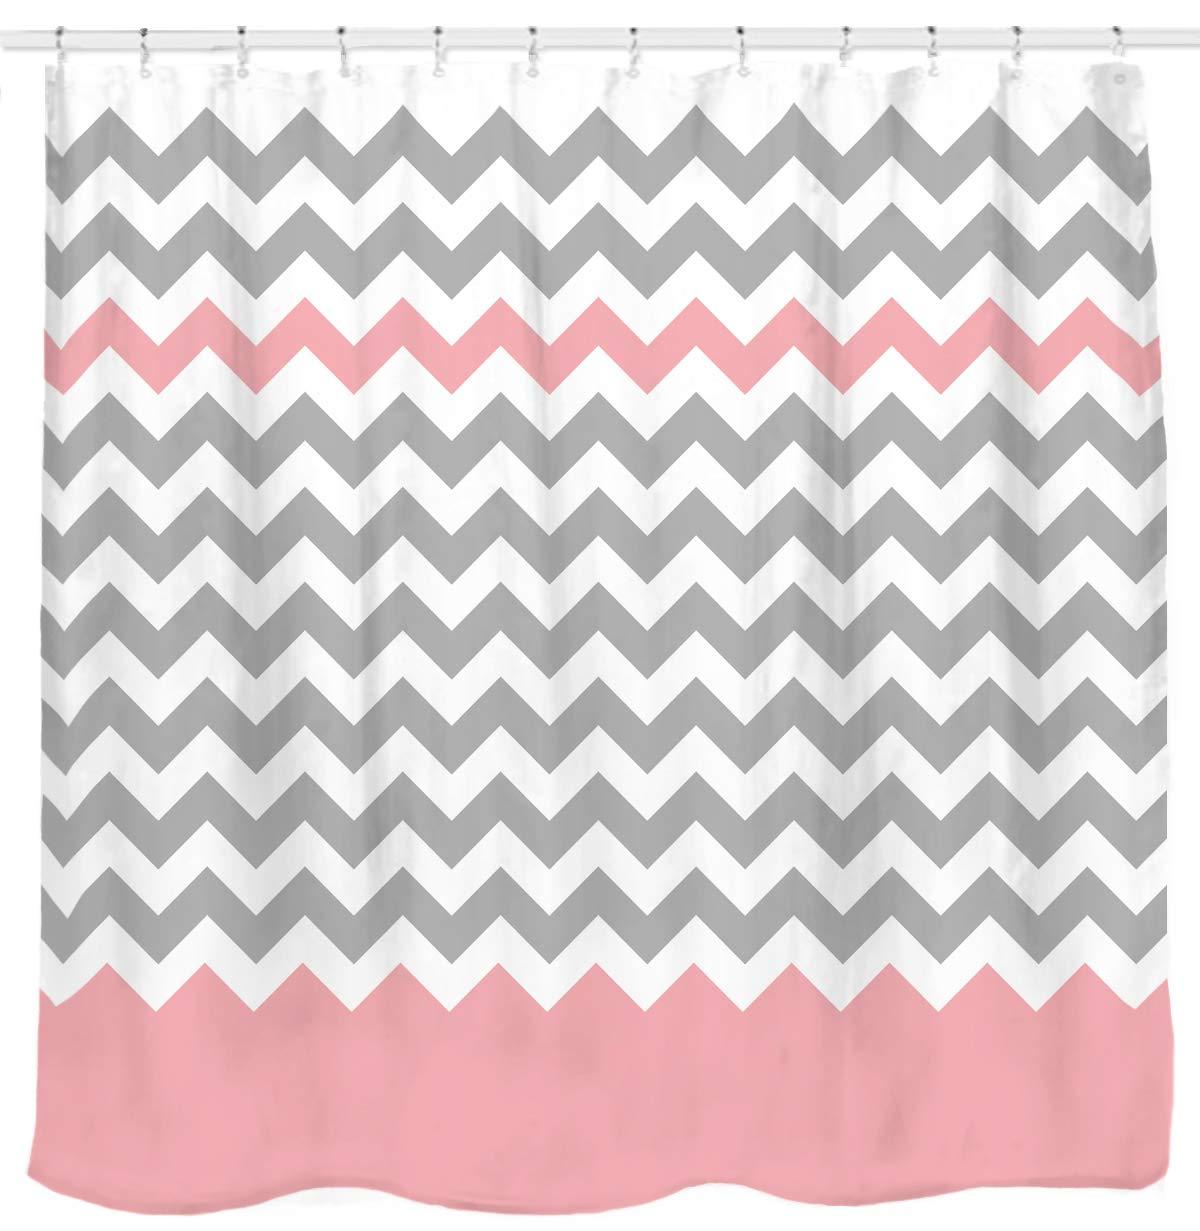 Sunlit Zigzag Pink And Grey White Chevron Shower Curtain Geometric Print Zig Zag Pattern Lines Contemporary Stripes Modern Design Fabric Bathroom Decor